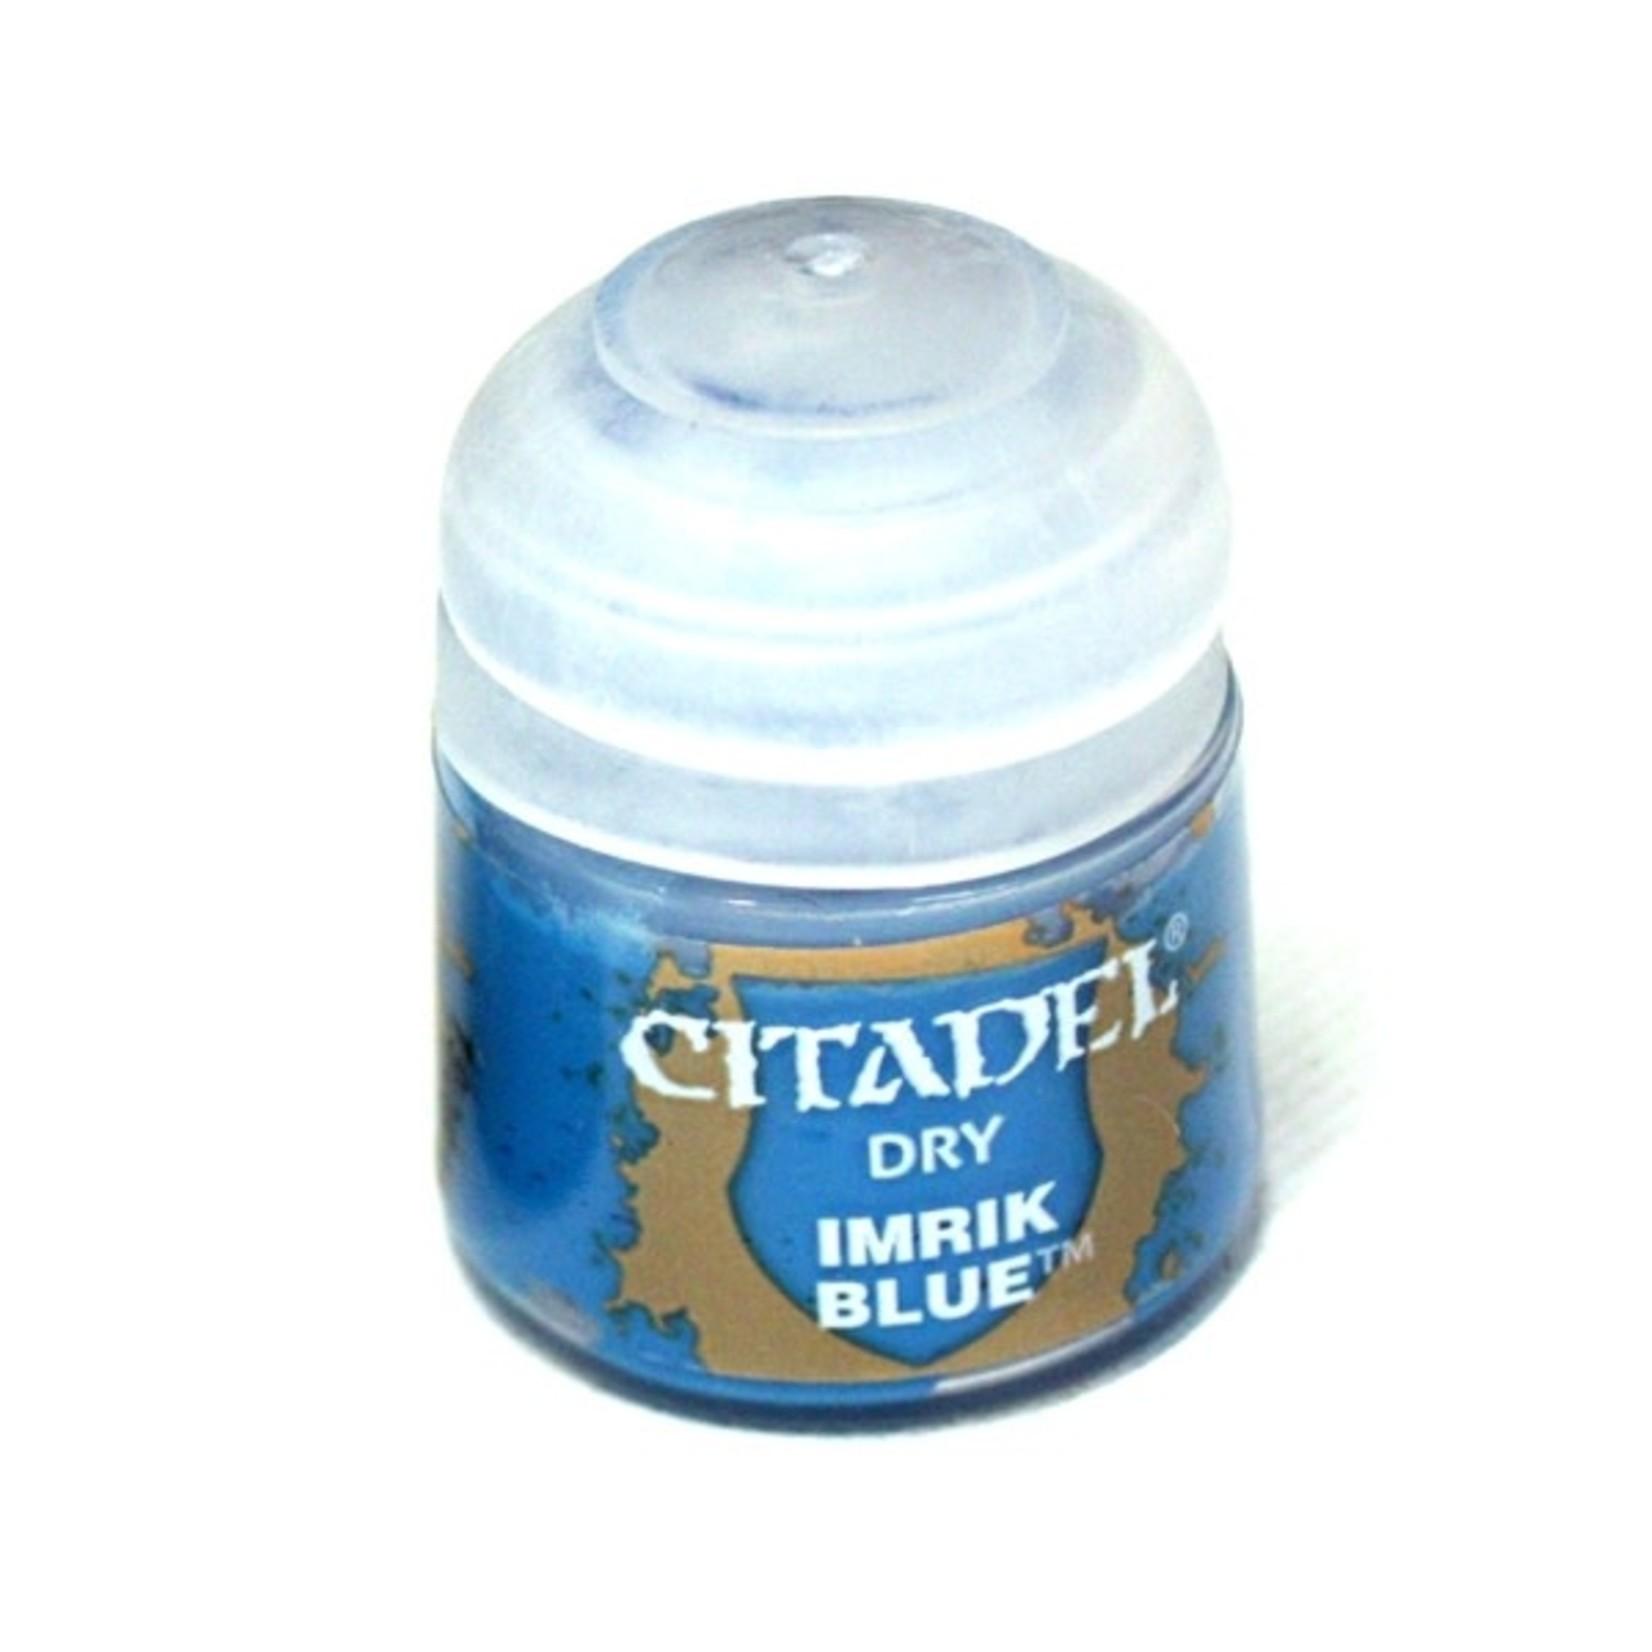 Games Workshop Citadel Paint: Imrik Blue Dry